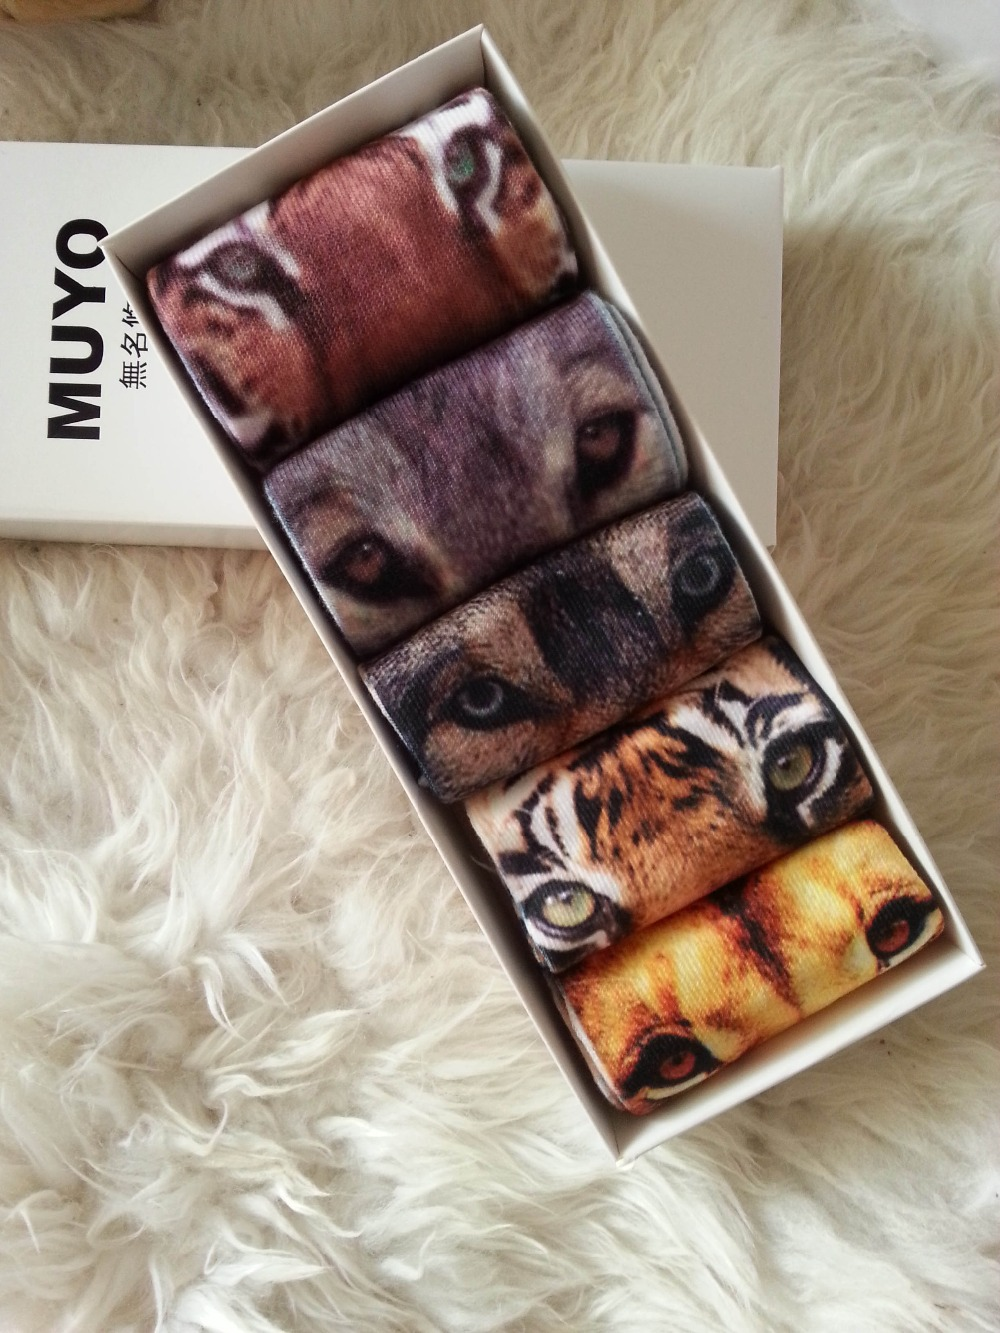 Animal fierce beast print socks 2 long and 3 ankle socks valuable gift bag set pure cotton socks birthday gift present(China (Mainland))